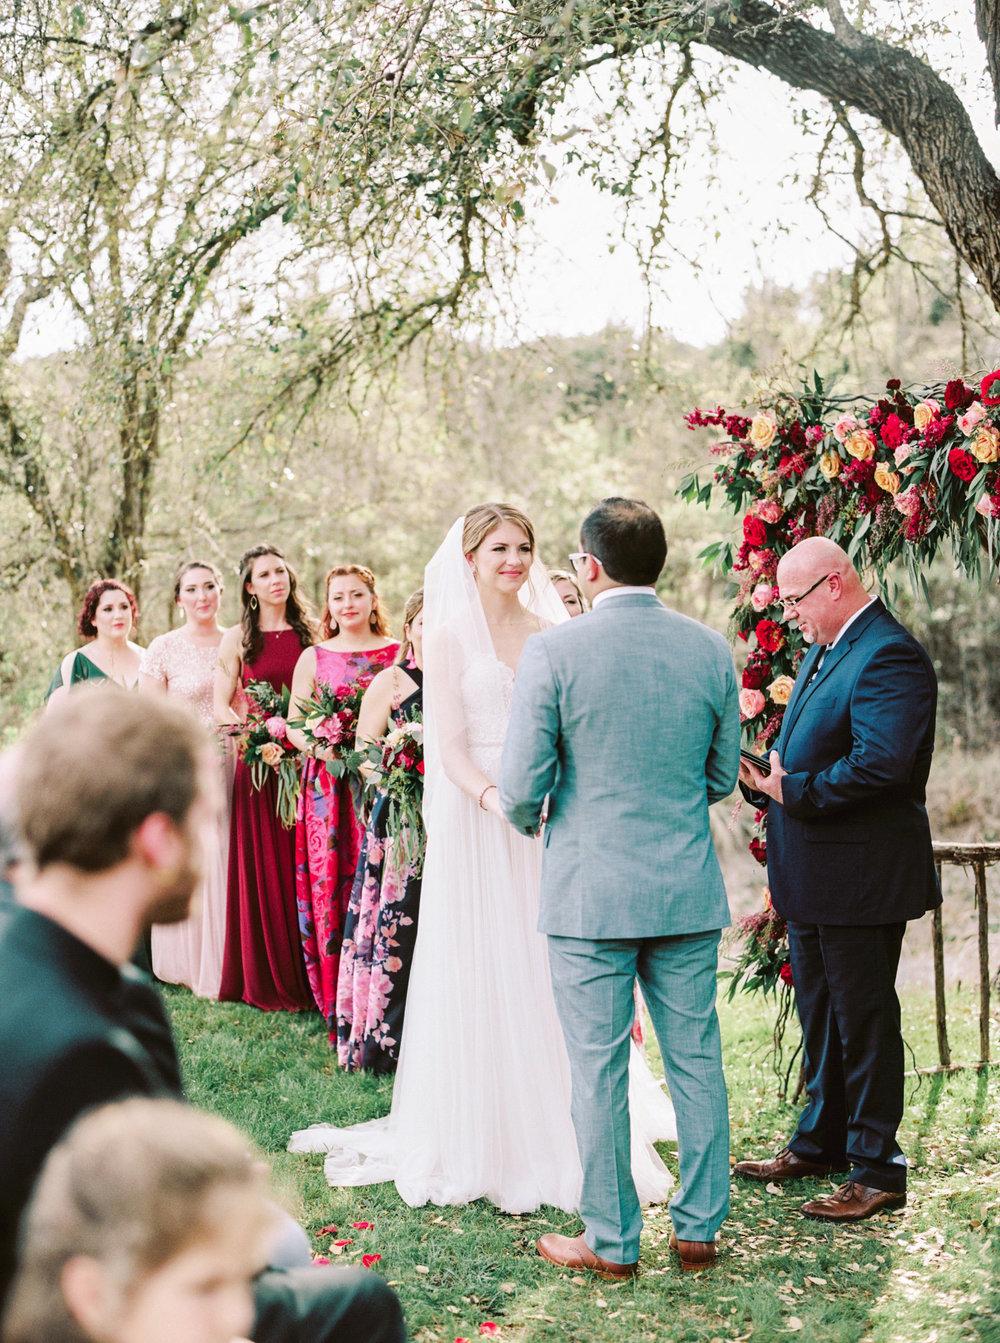 The-Creek-Haus-Wedding-Dripping-Springs-92.jpg